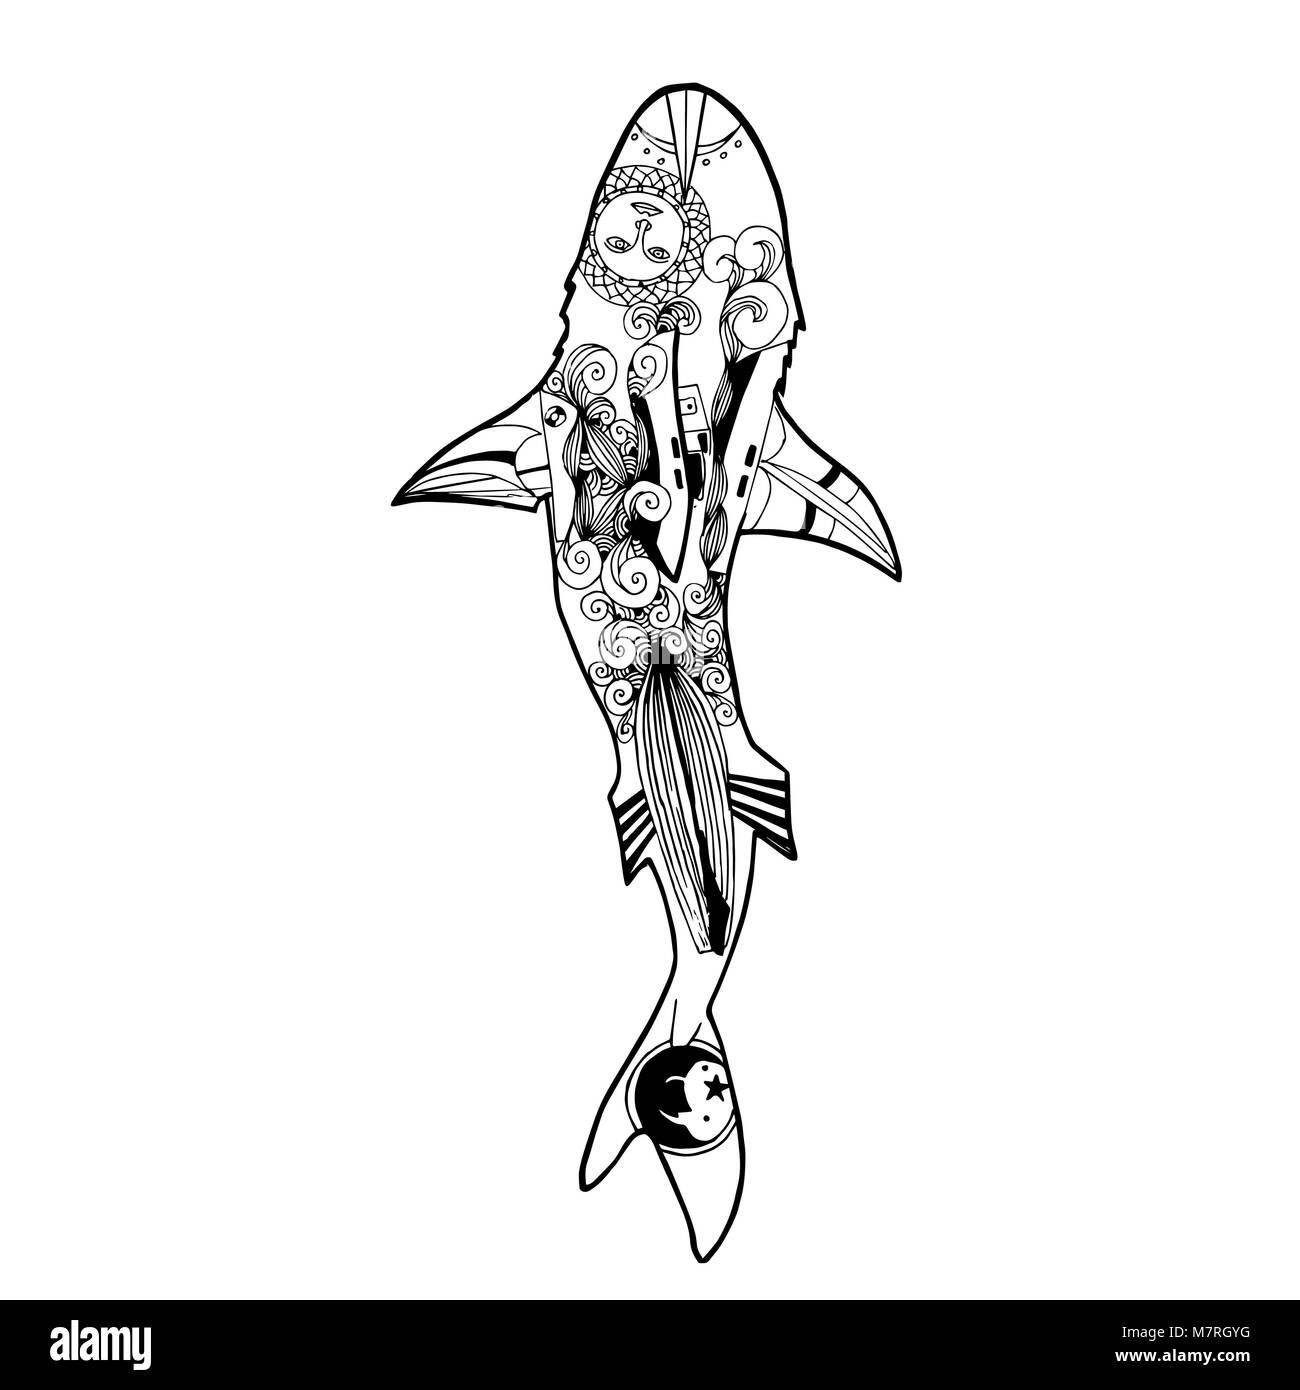 Ilustración vectorial de zentangle tiburón. Libro para colorear de ...